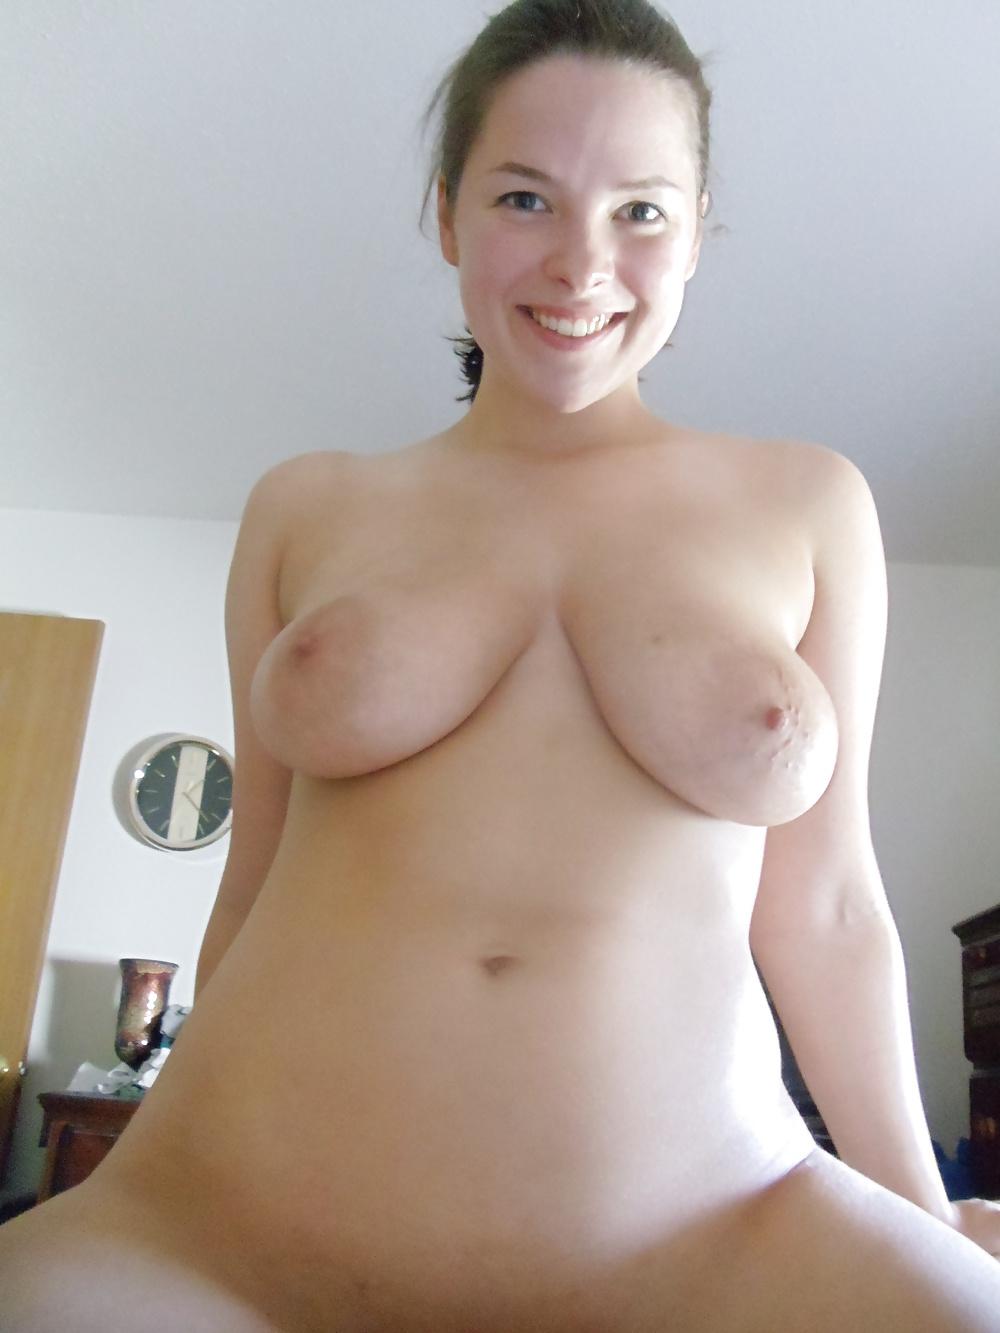 Hermosa gordibuena de cali masturbandose por webcam - 2 part 6